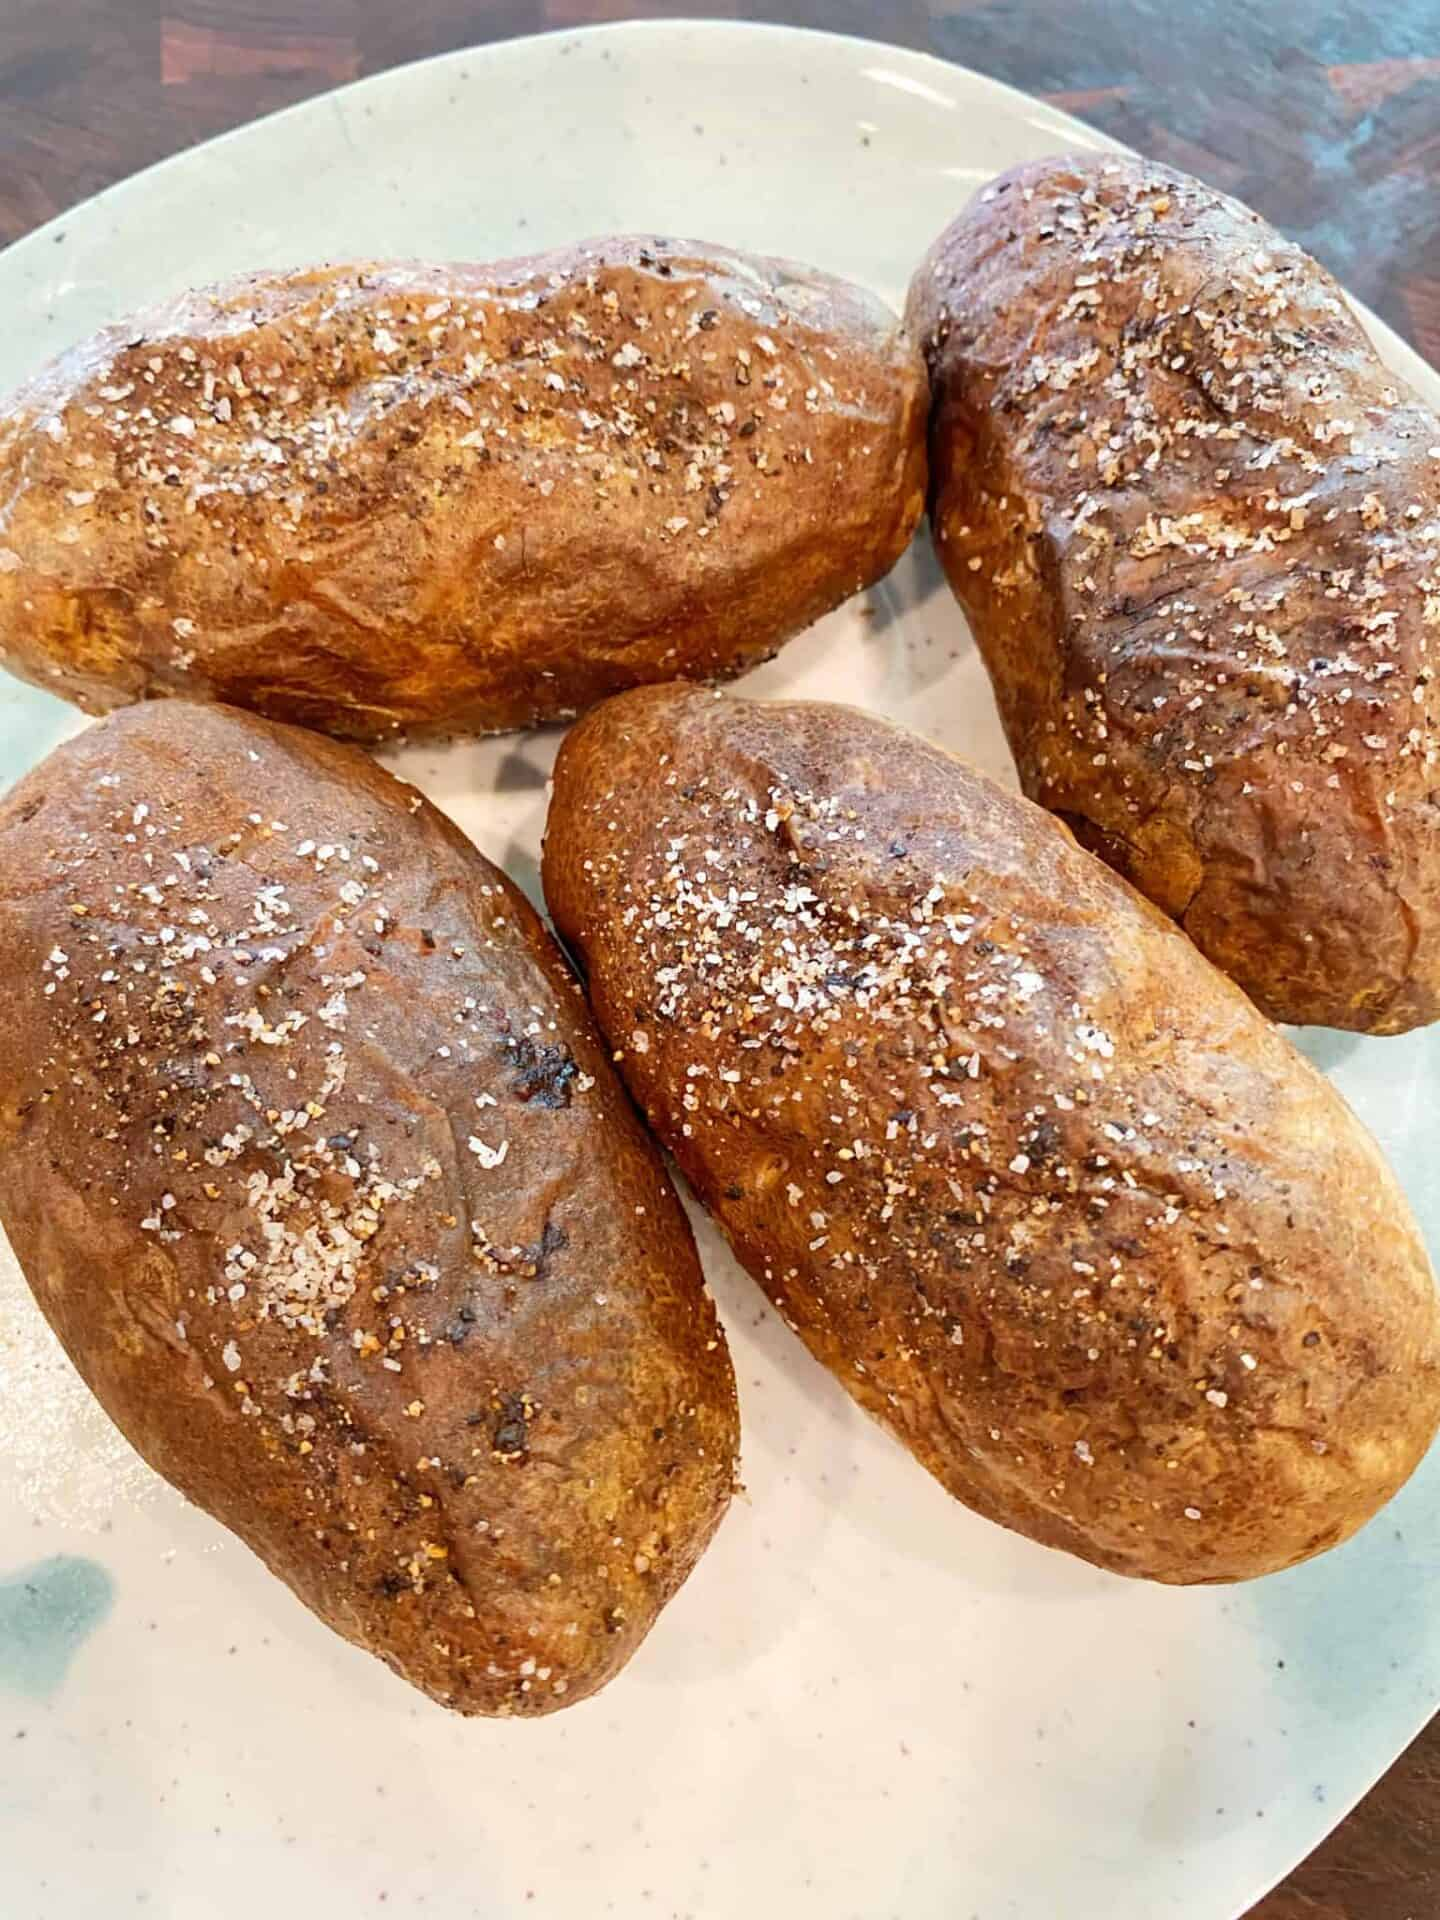 twice-baked-potatoes-how-to-bake